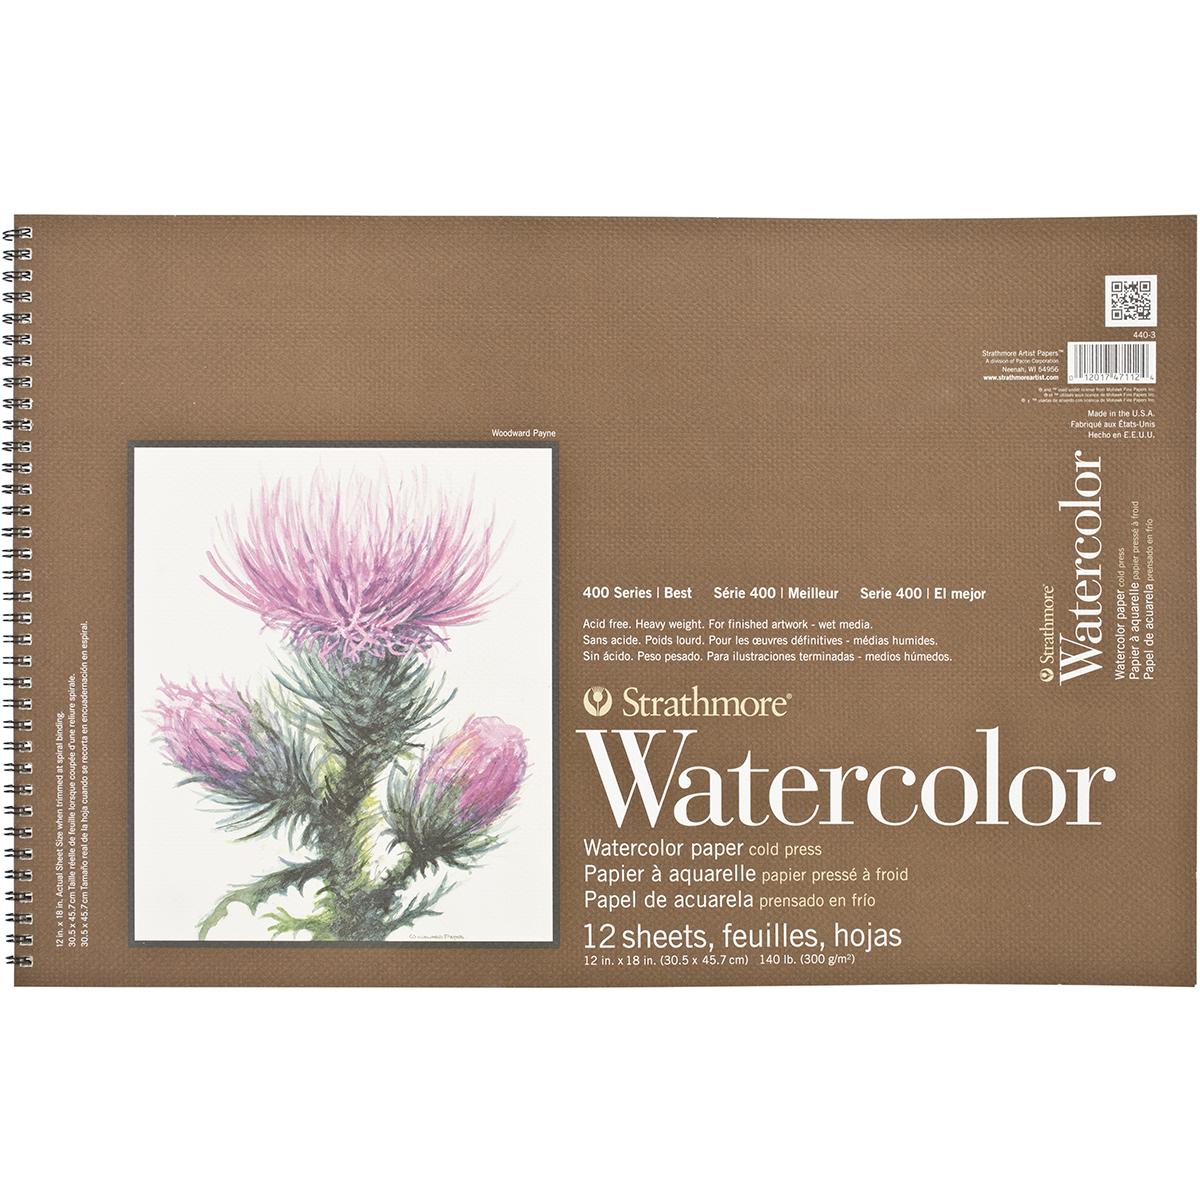 "Strathmore 12"" x 18"" Cold Press Wire Bound Watercolor Pad"